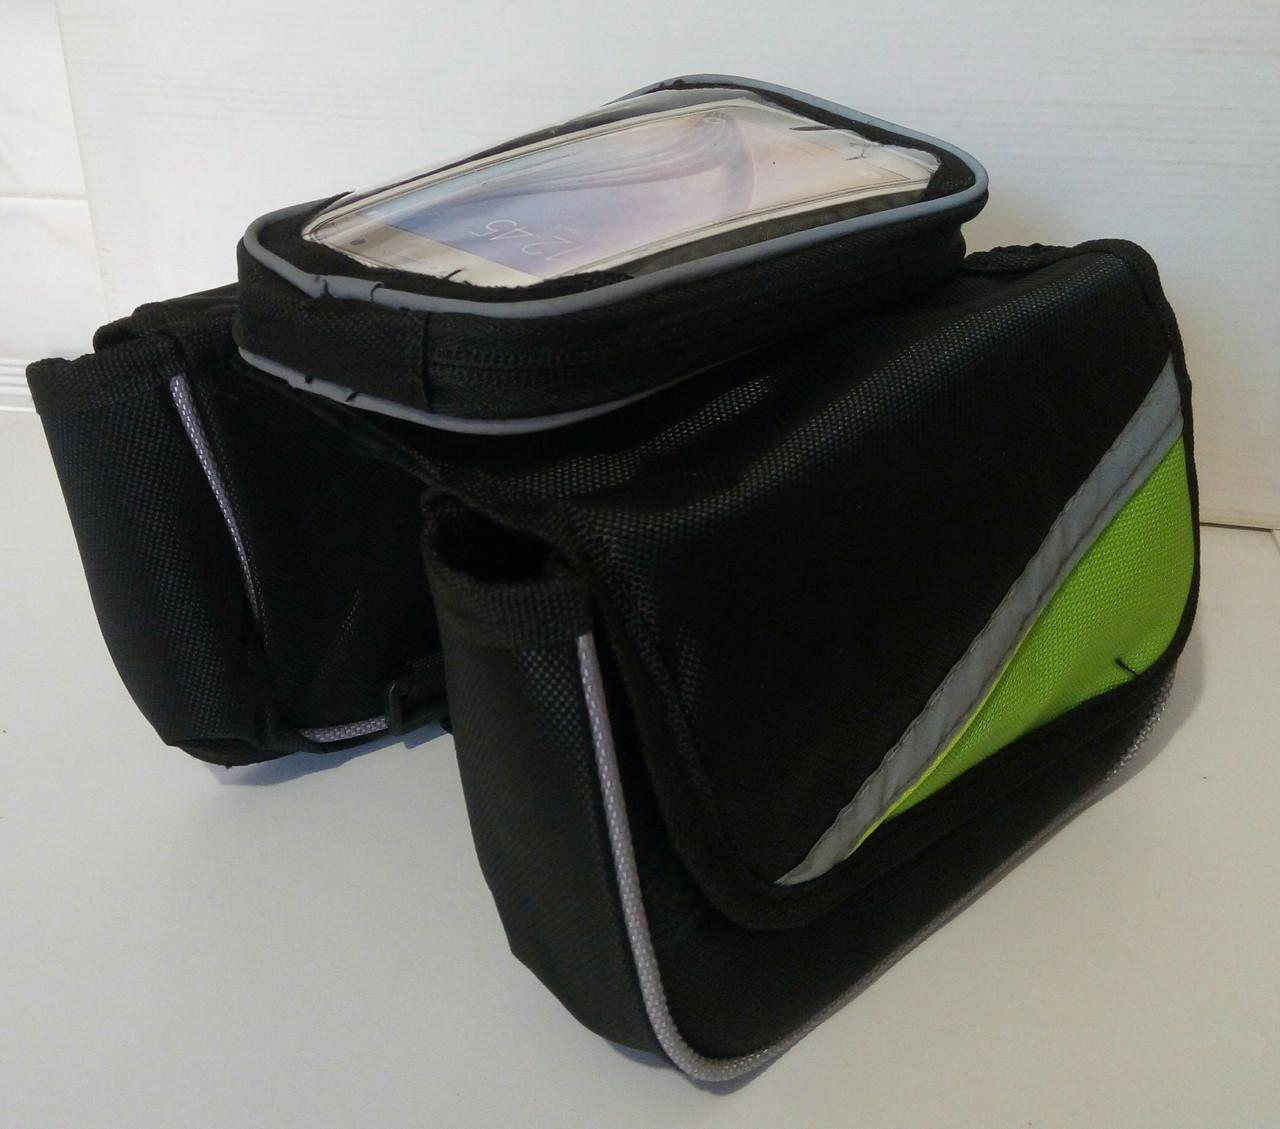 Сумка на раму,велосумка на велосипед для смартфона на телефон 7 ,нарамная сумка